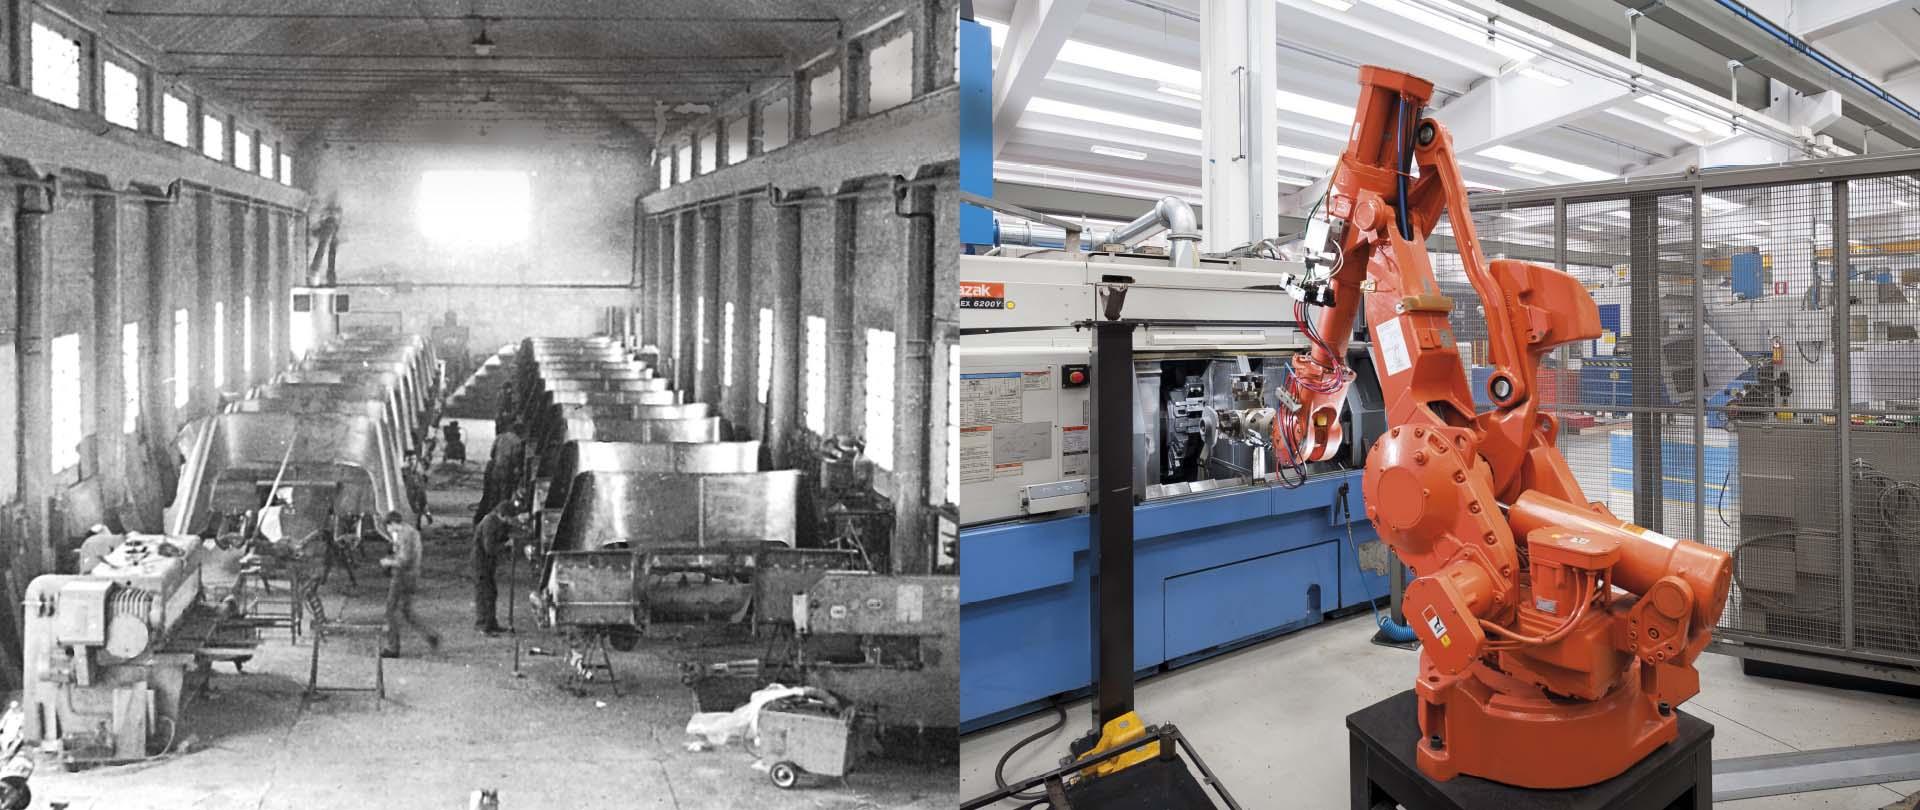 Olimac-vecchio-e-nuovo-stabilimento-old-and-new-plant-altes-und-neues-Werk-vieja-y-nueva-planta